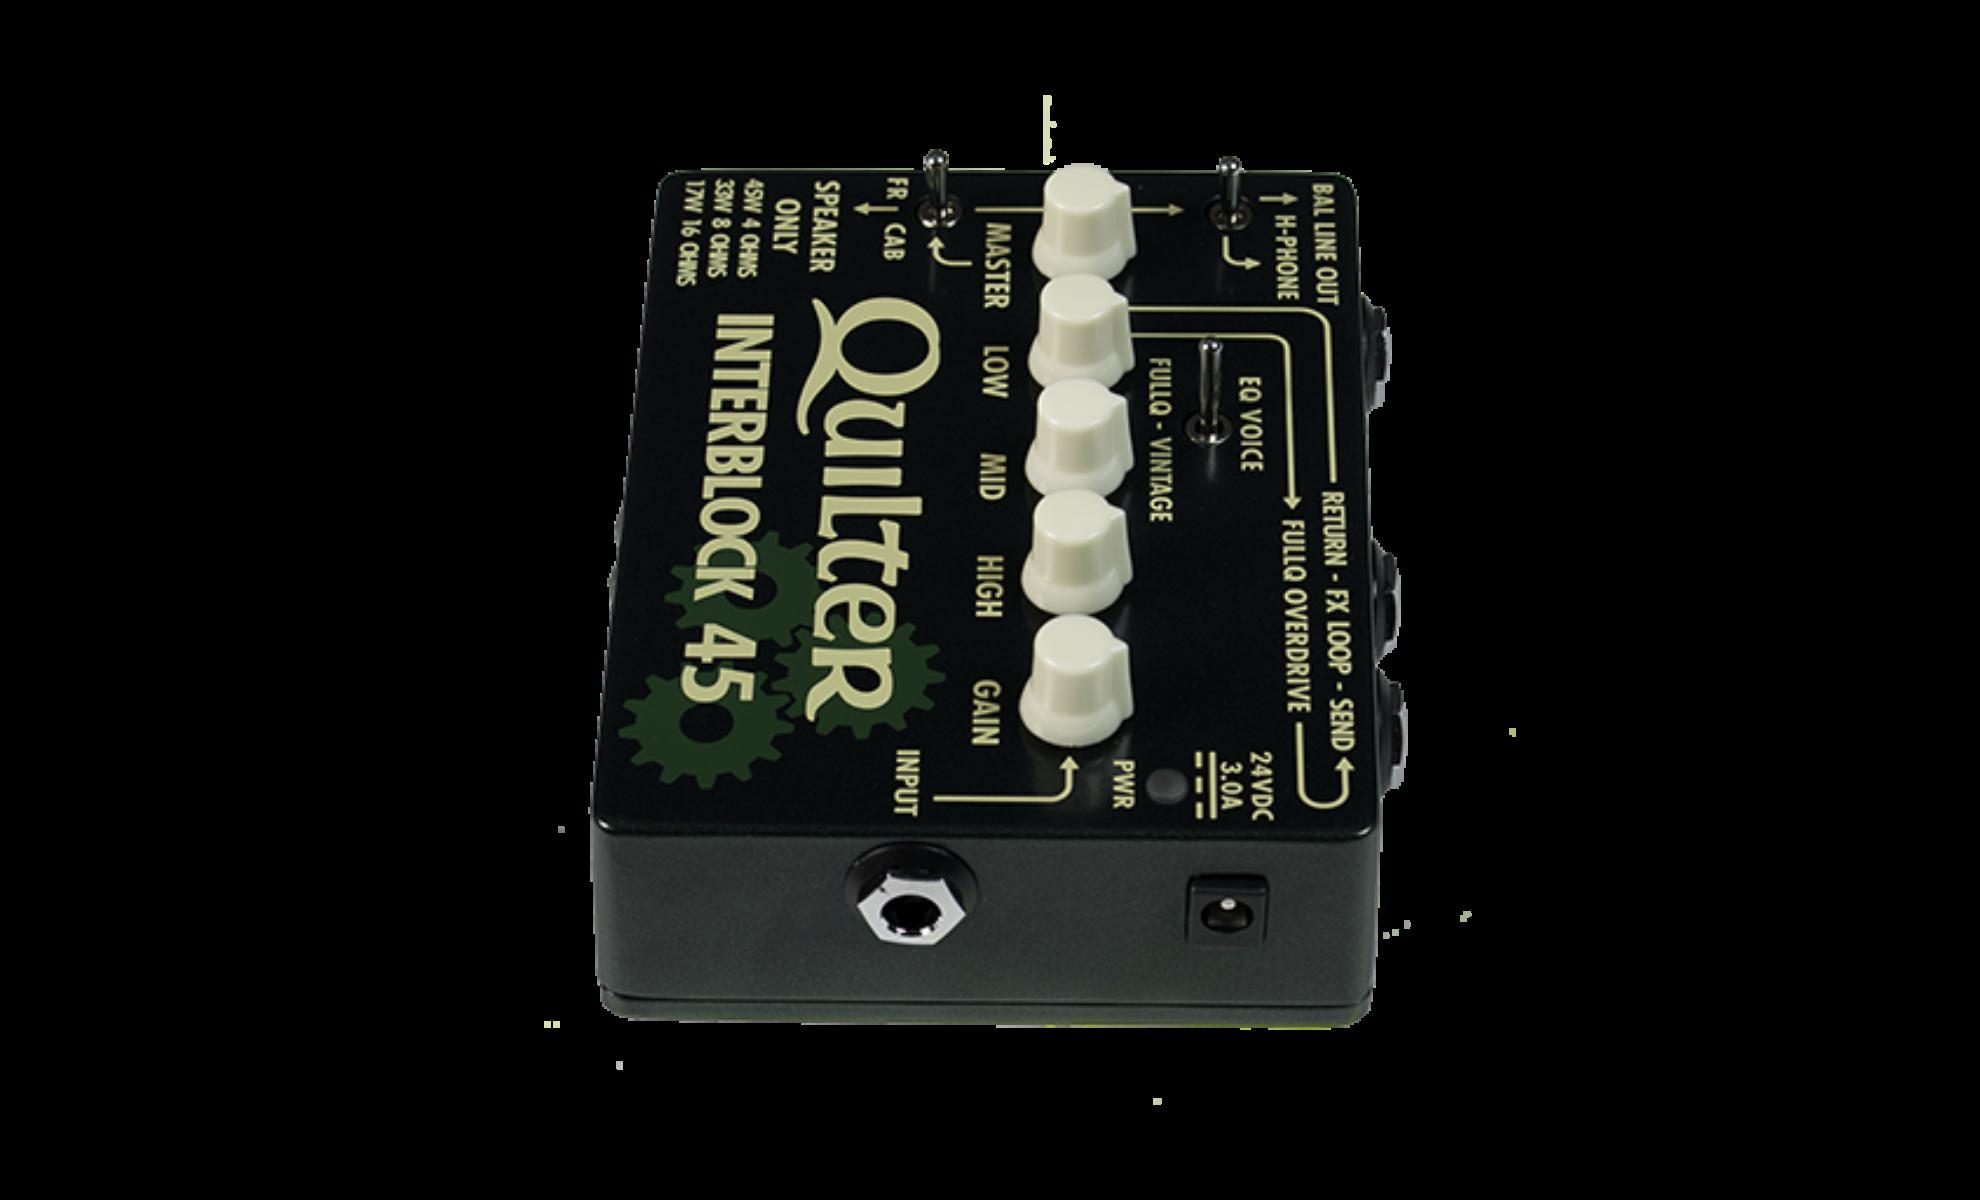 quilter interblock45 lightweight guitar amp rh lightweightguitaramp com